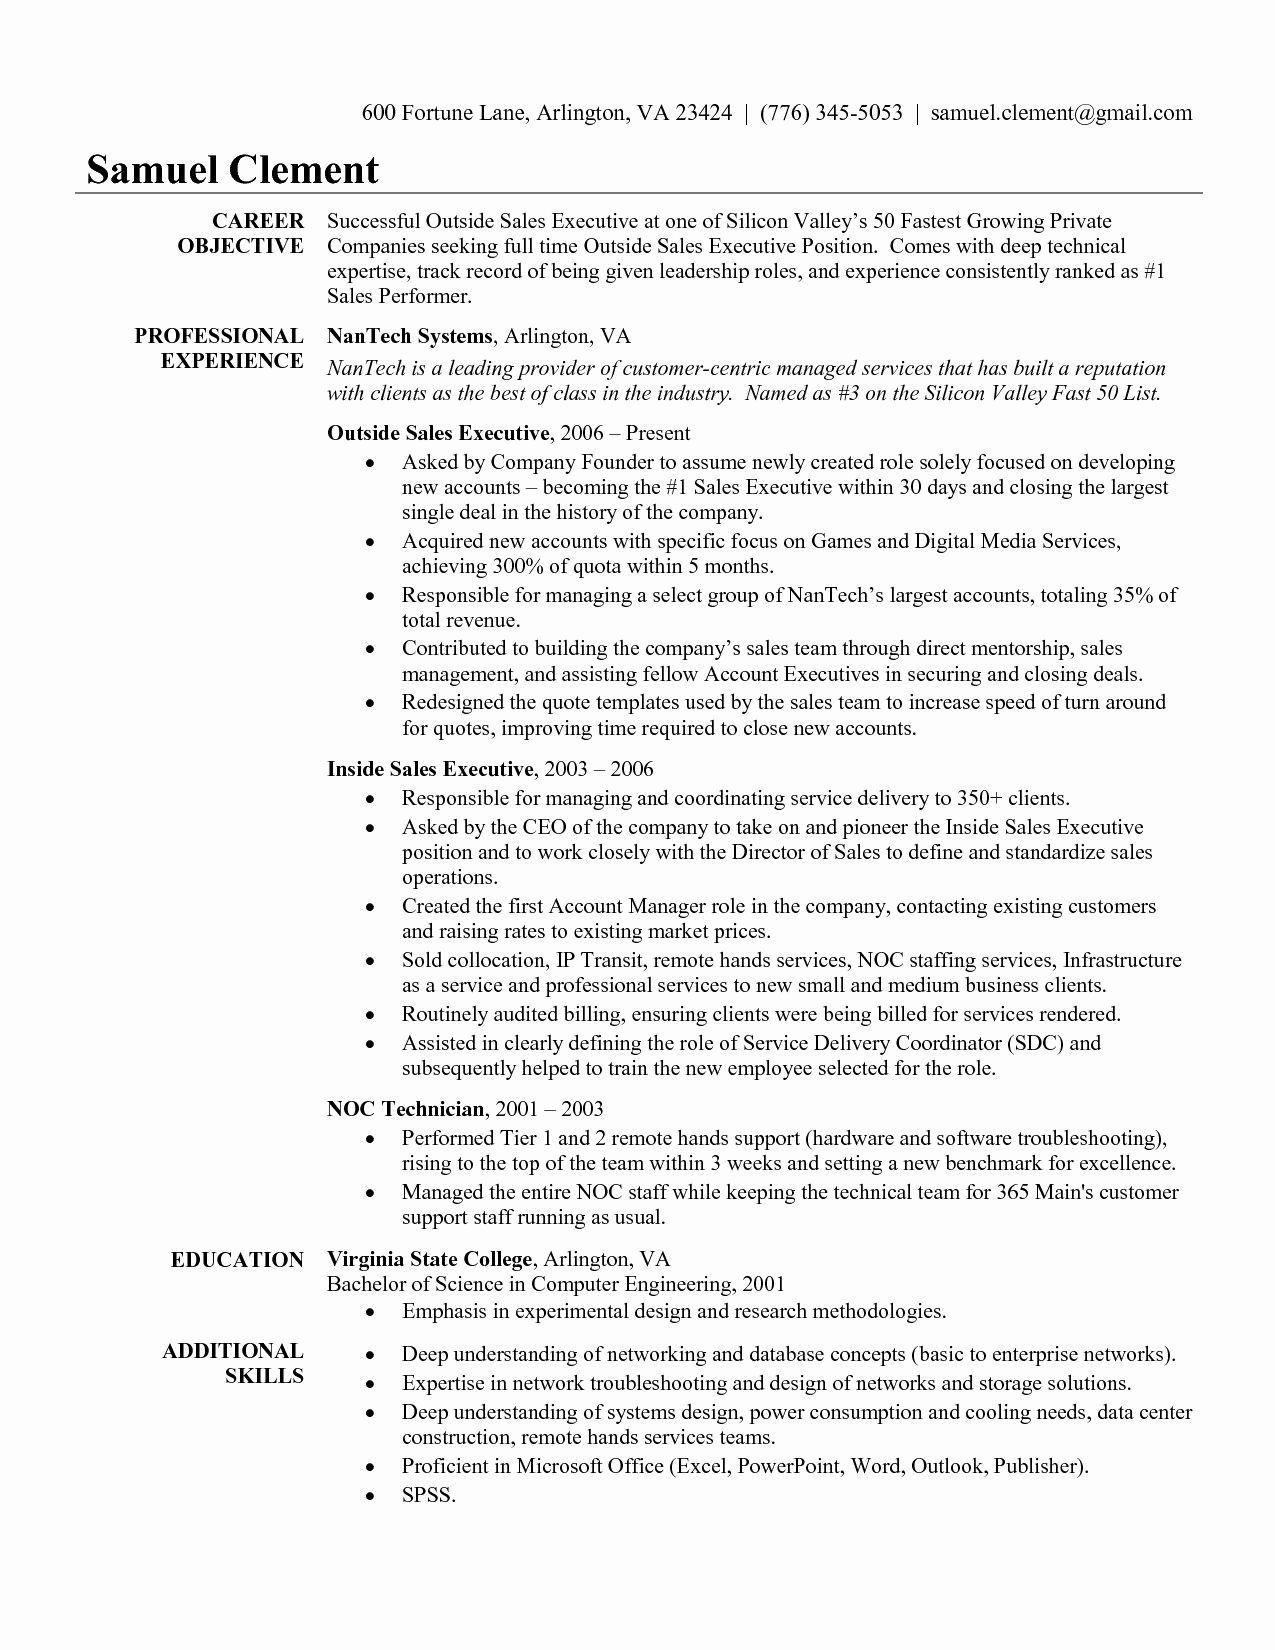 Tier 2 Resume Examples 1 Resume Examples Resume Manager